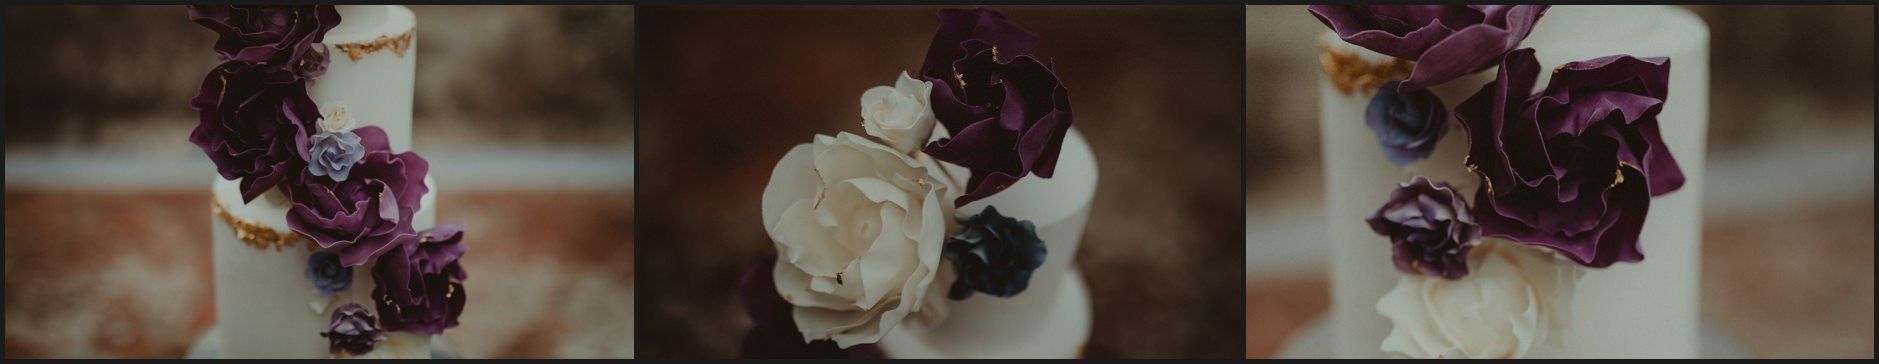 wedding cake, details, flowers, villa medicea di lilliano, tuscany